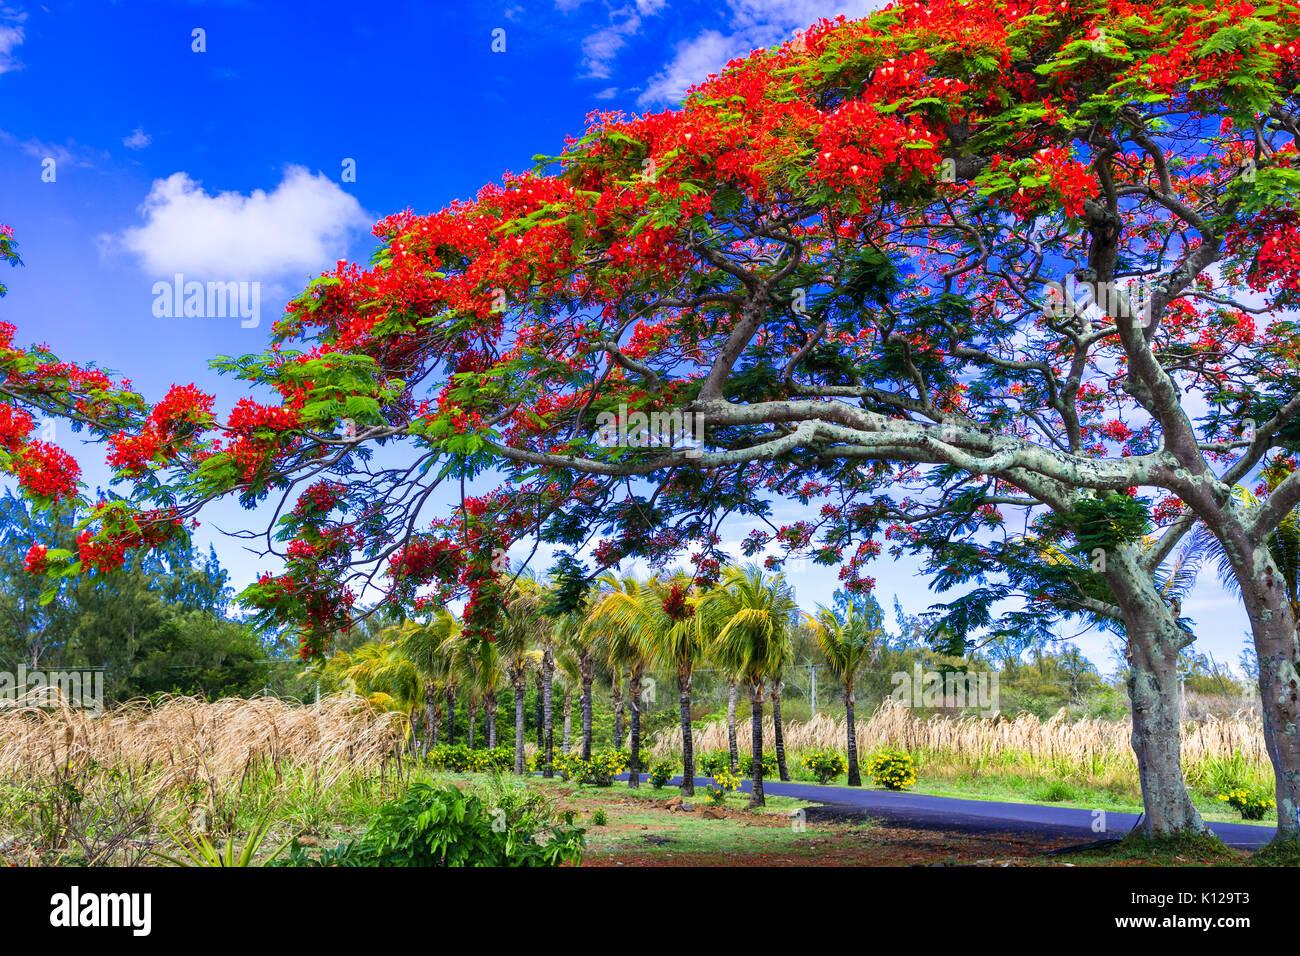 beautiful exotic tree with red flowers Flamboyant. mauritius island - Stock Image